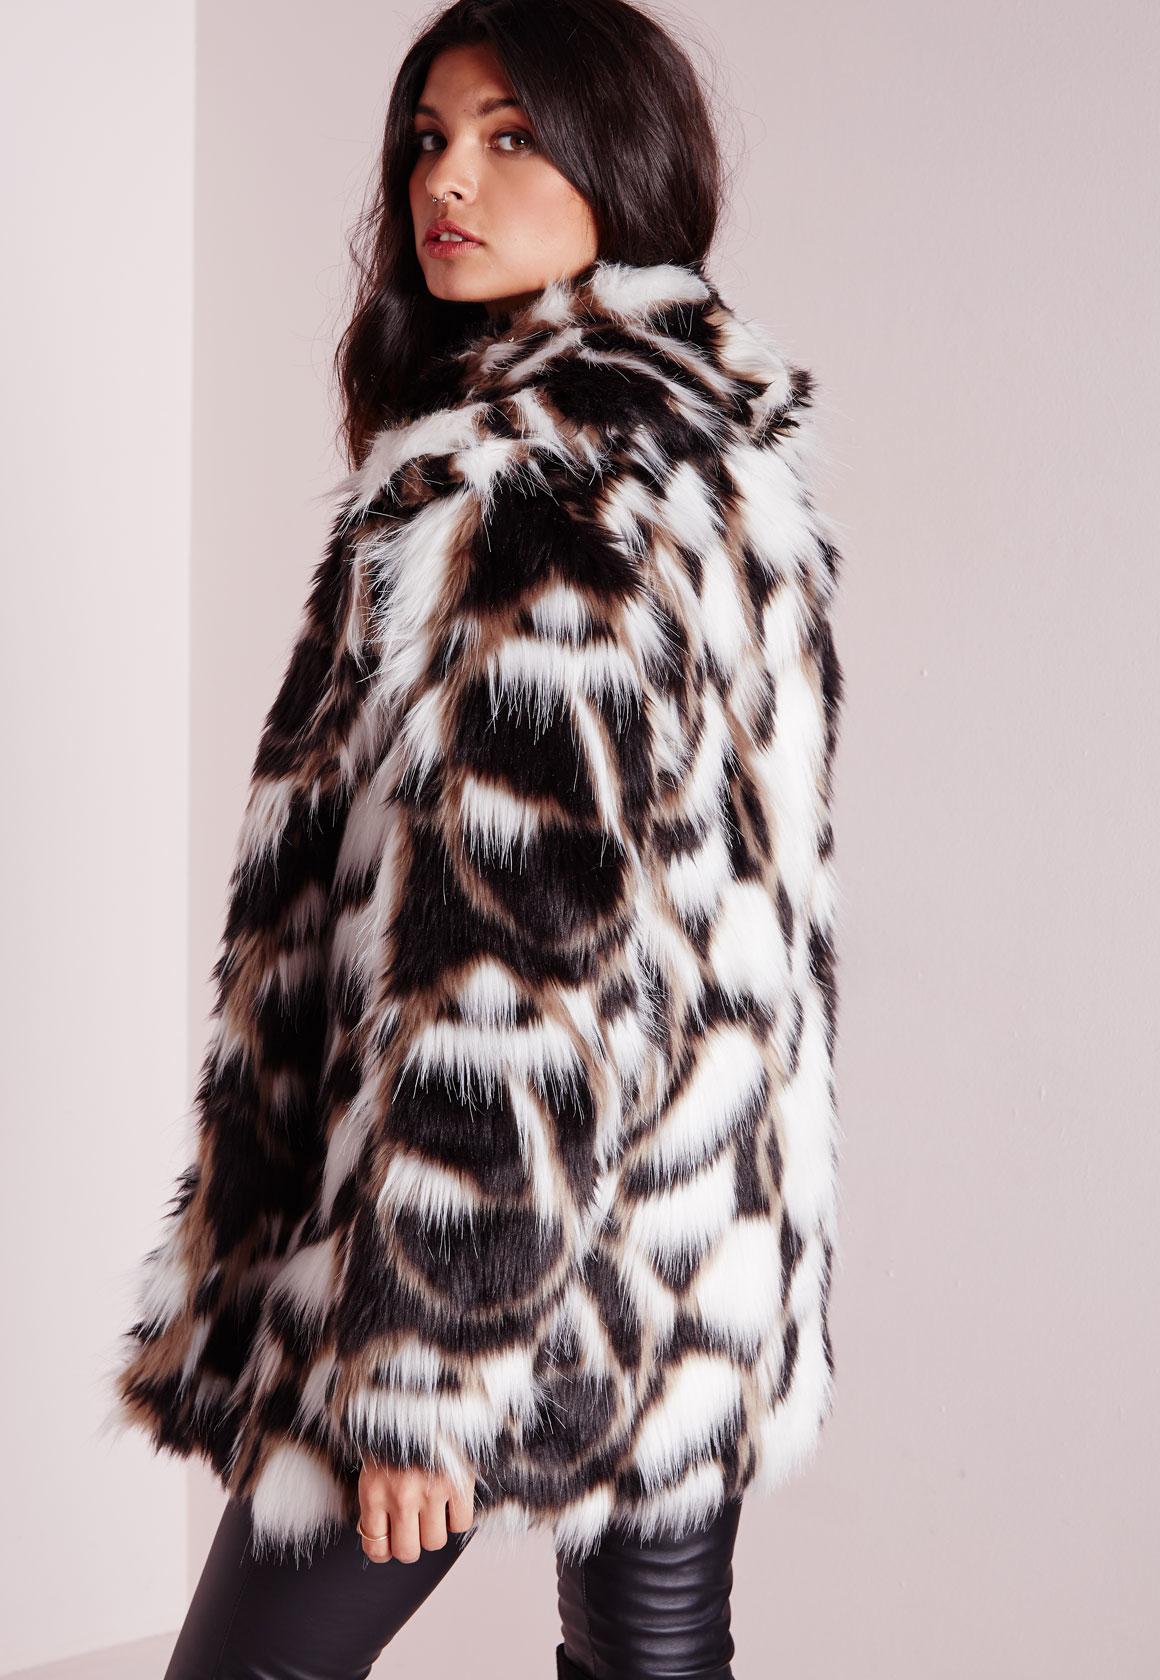 d0869c6fb543 Lyst - Missguided Patchwork Longline Faux Fur Coat Multi in Black